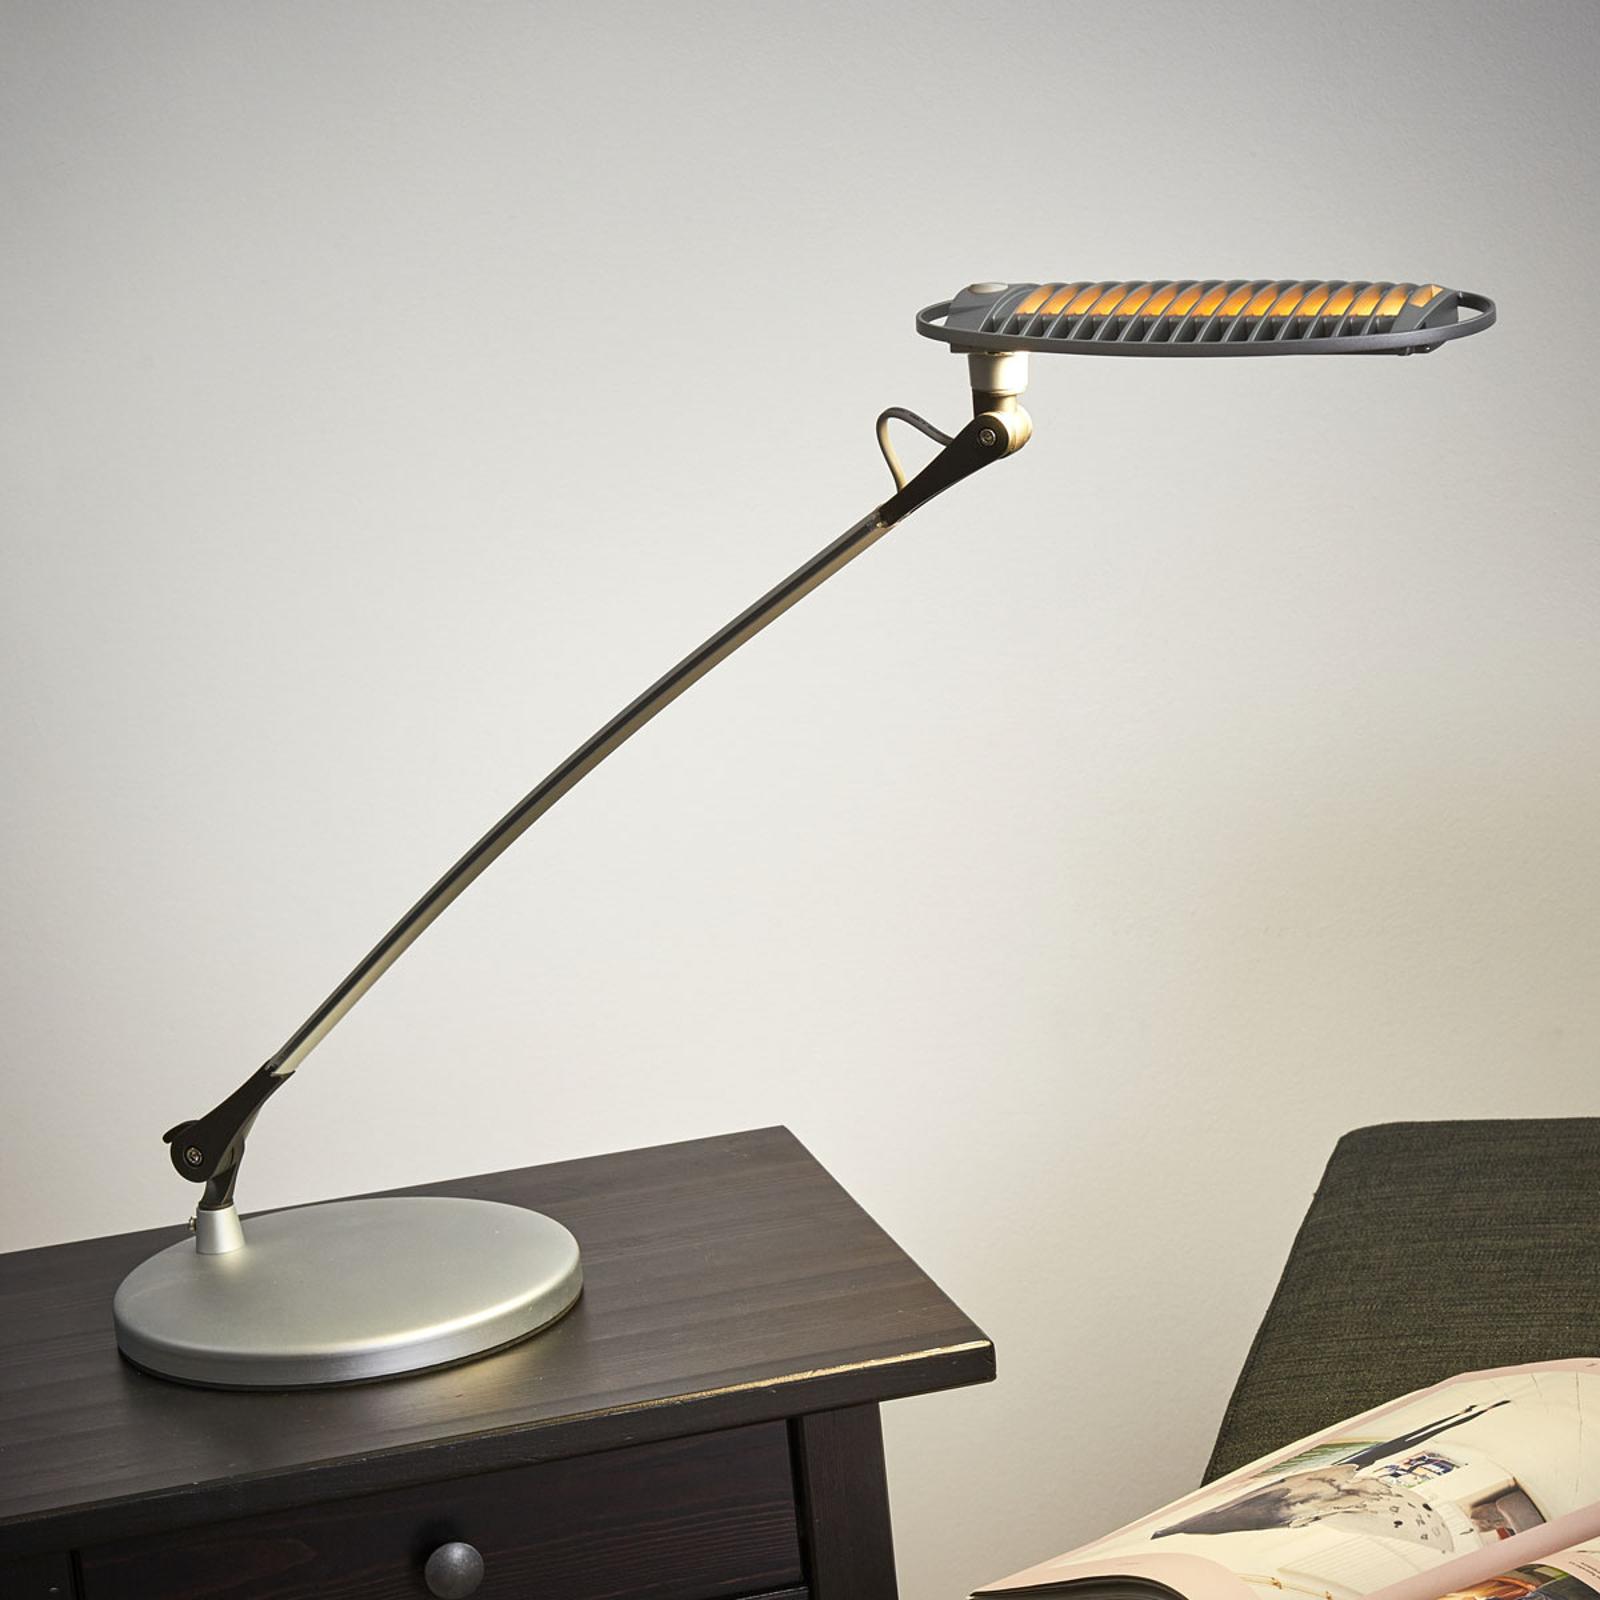 Calandre - LED-Tischleuchte, 12 W